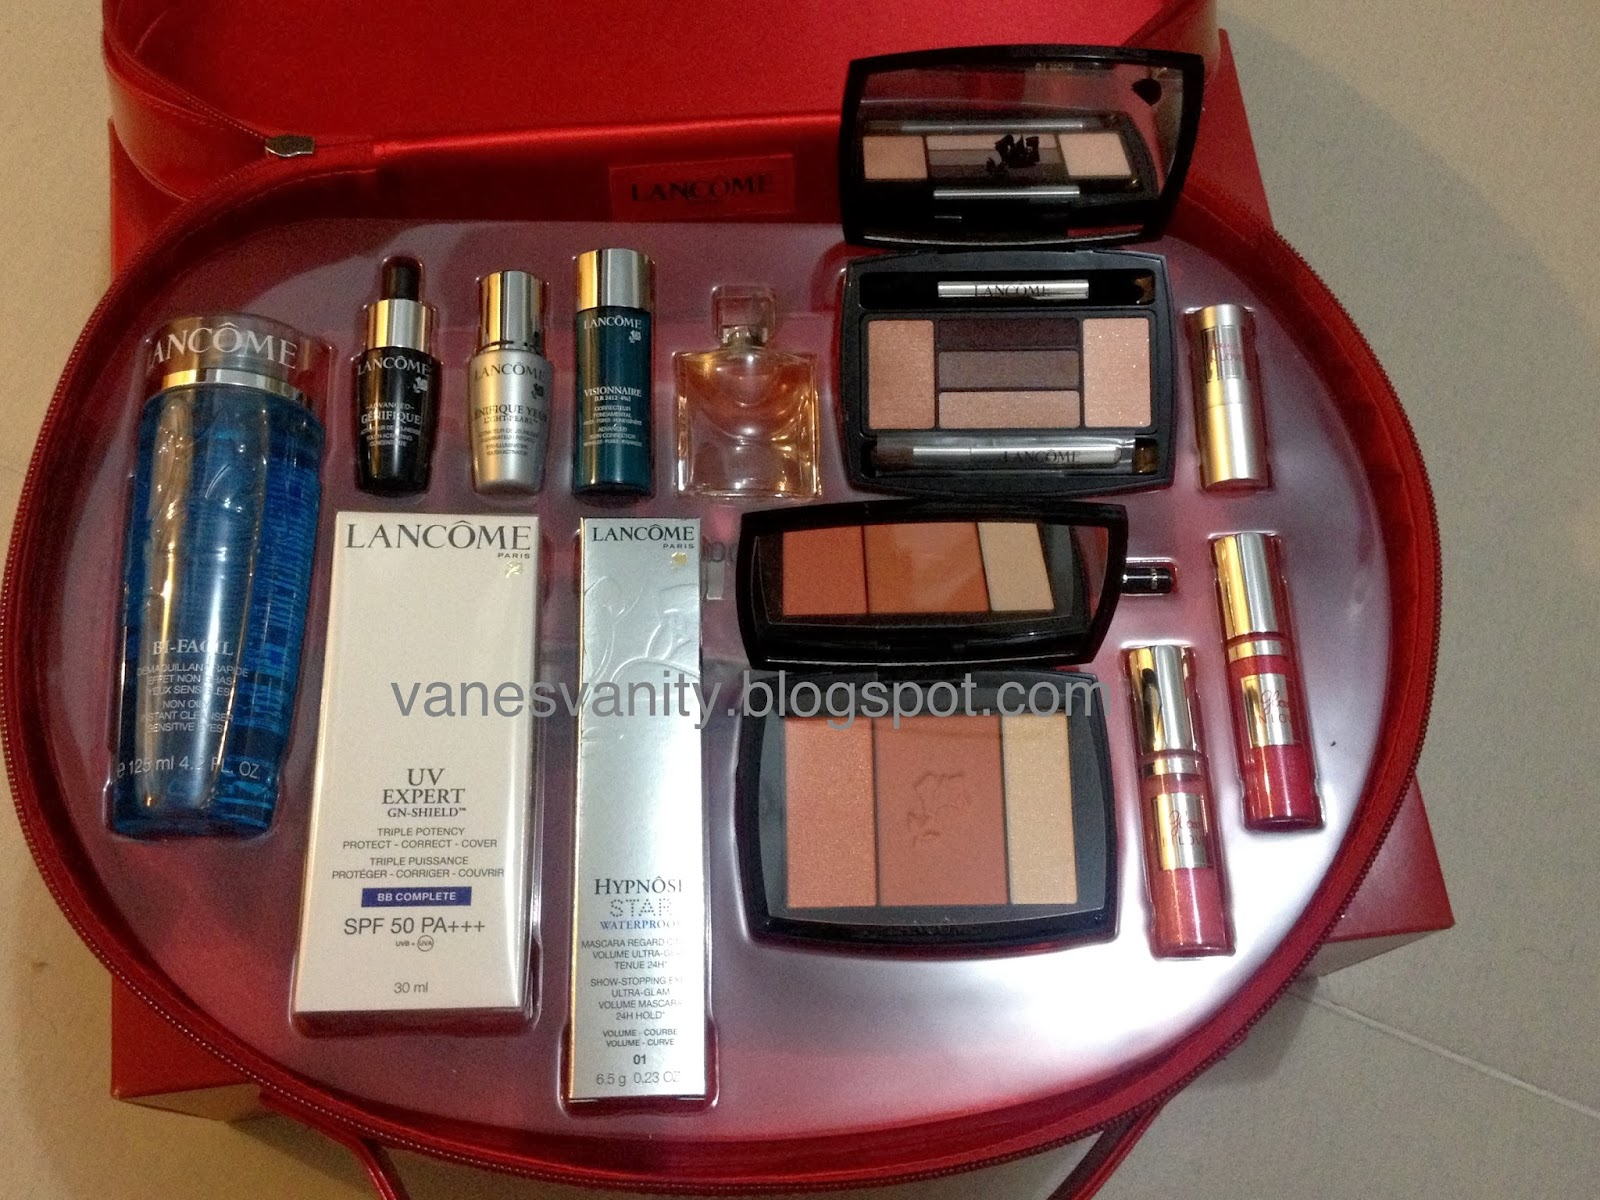 A Vane S Vanity Lancome Holiday 2013 Beauty Set Limited